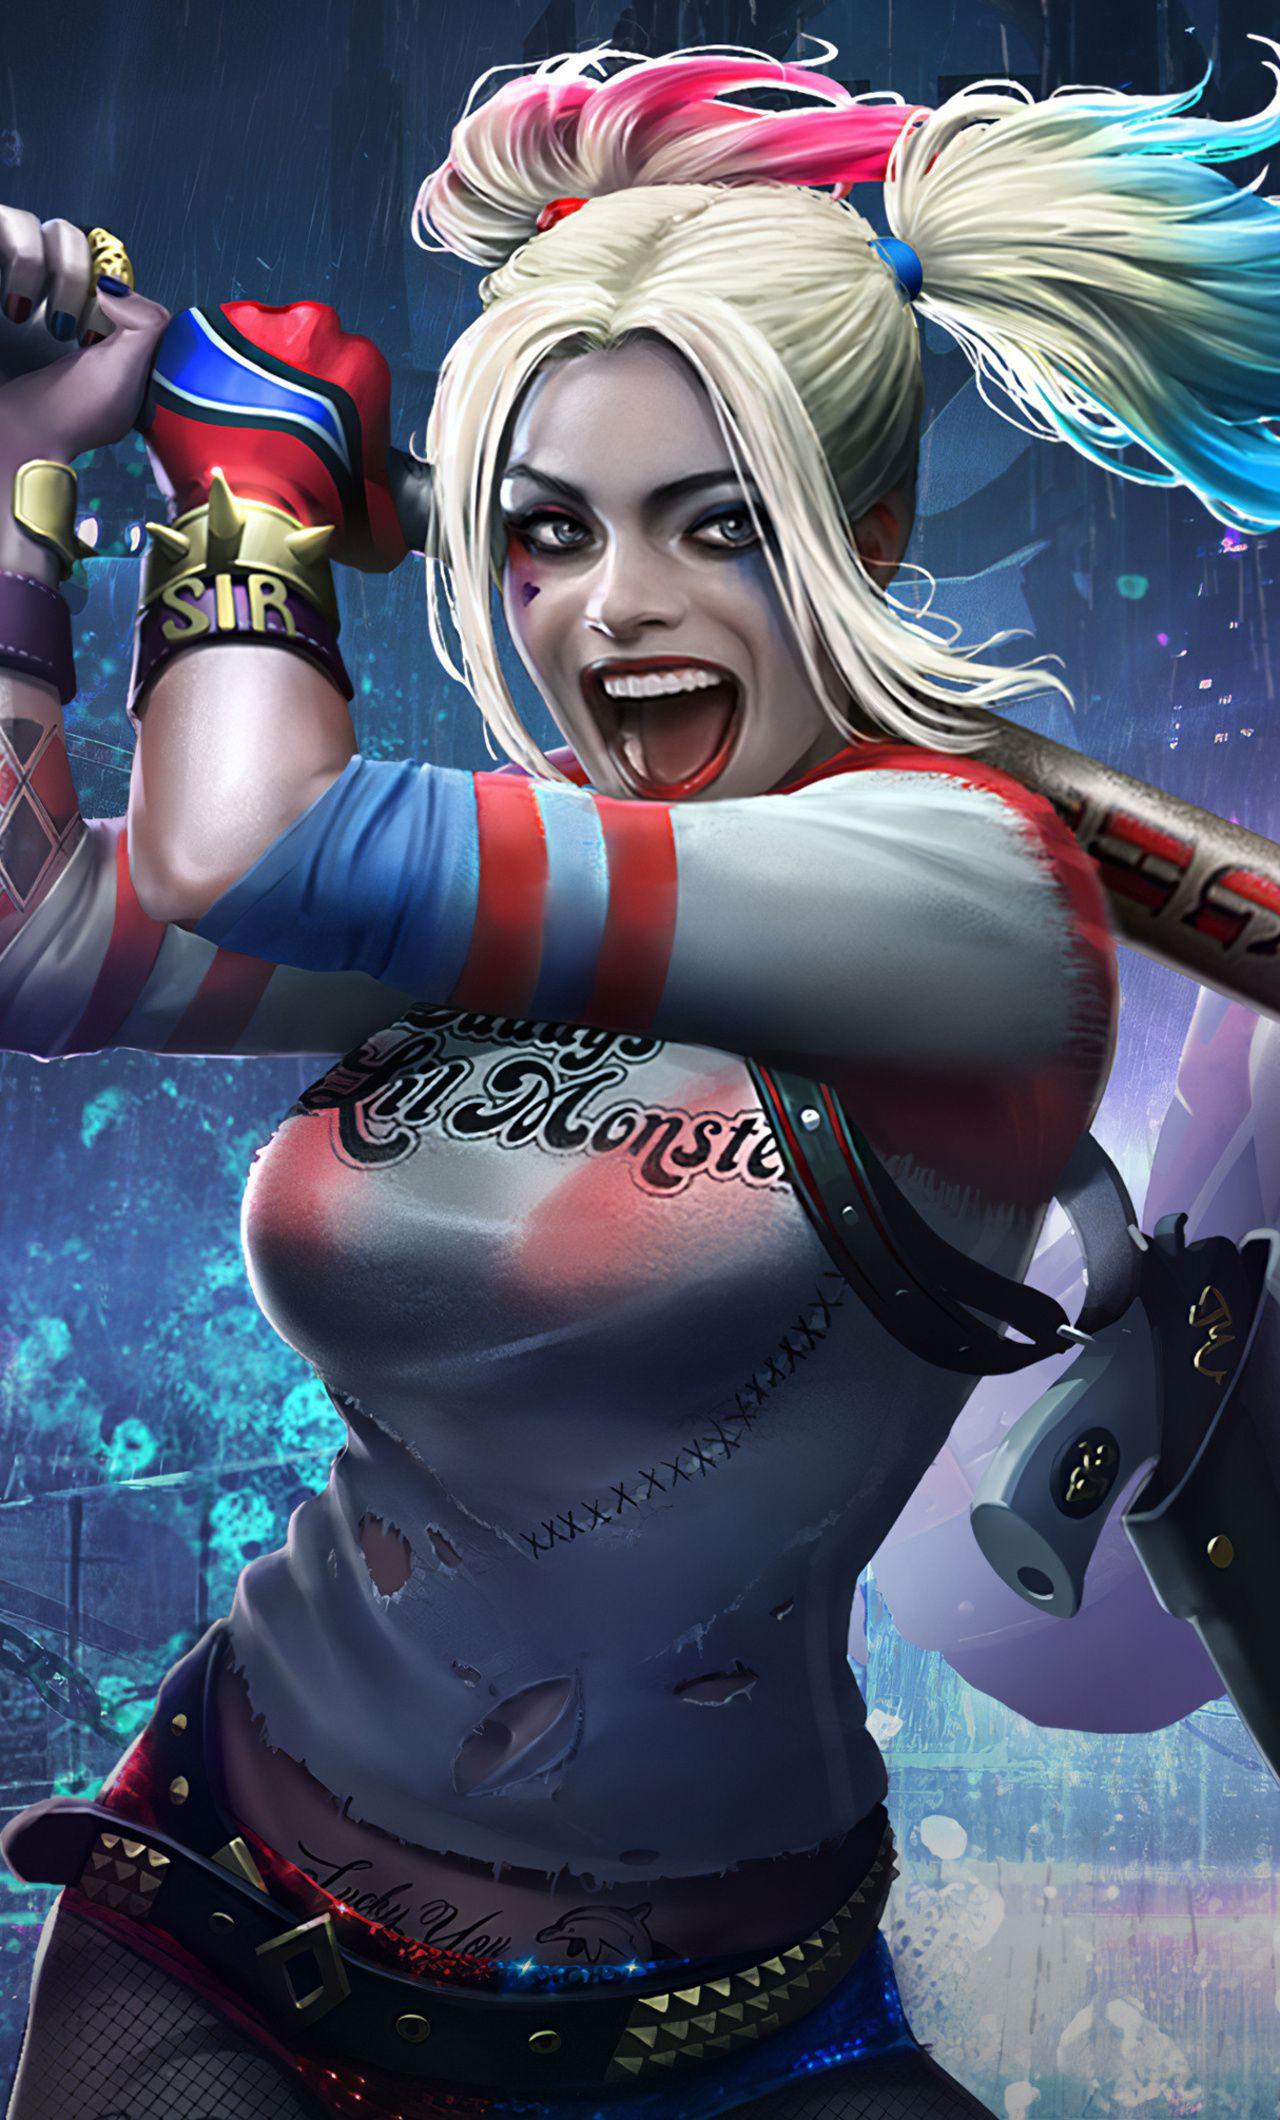 Harley Quinn HD Phone Wallpapers - Wallpaper Cave